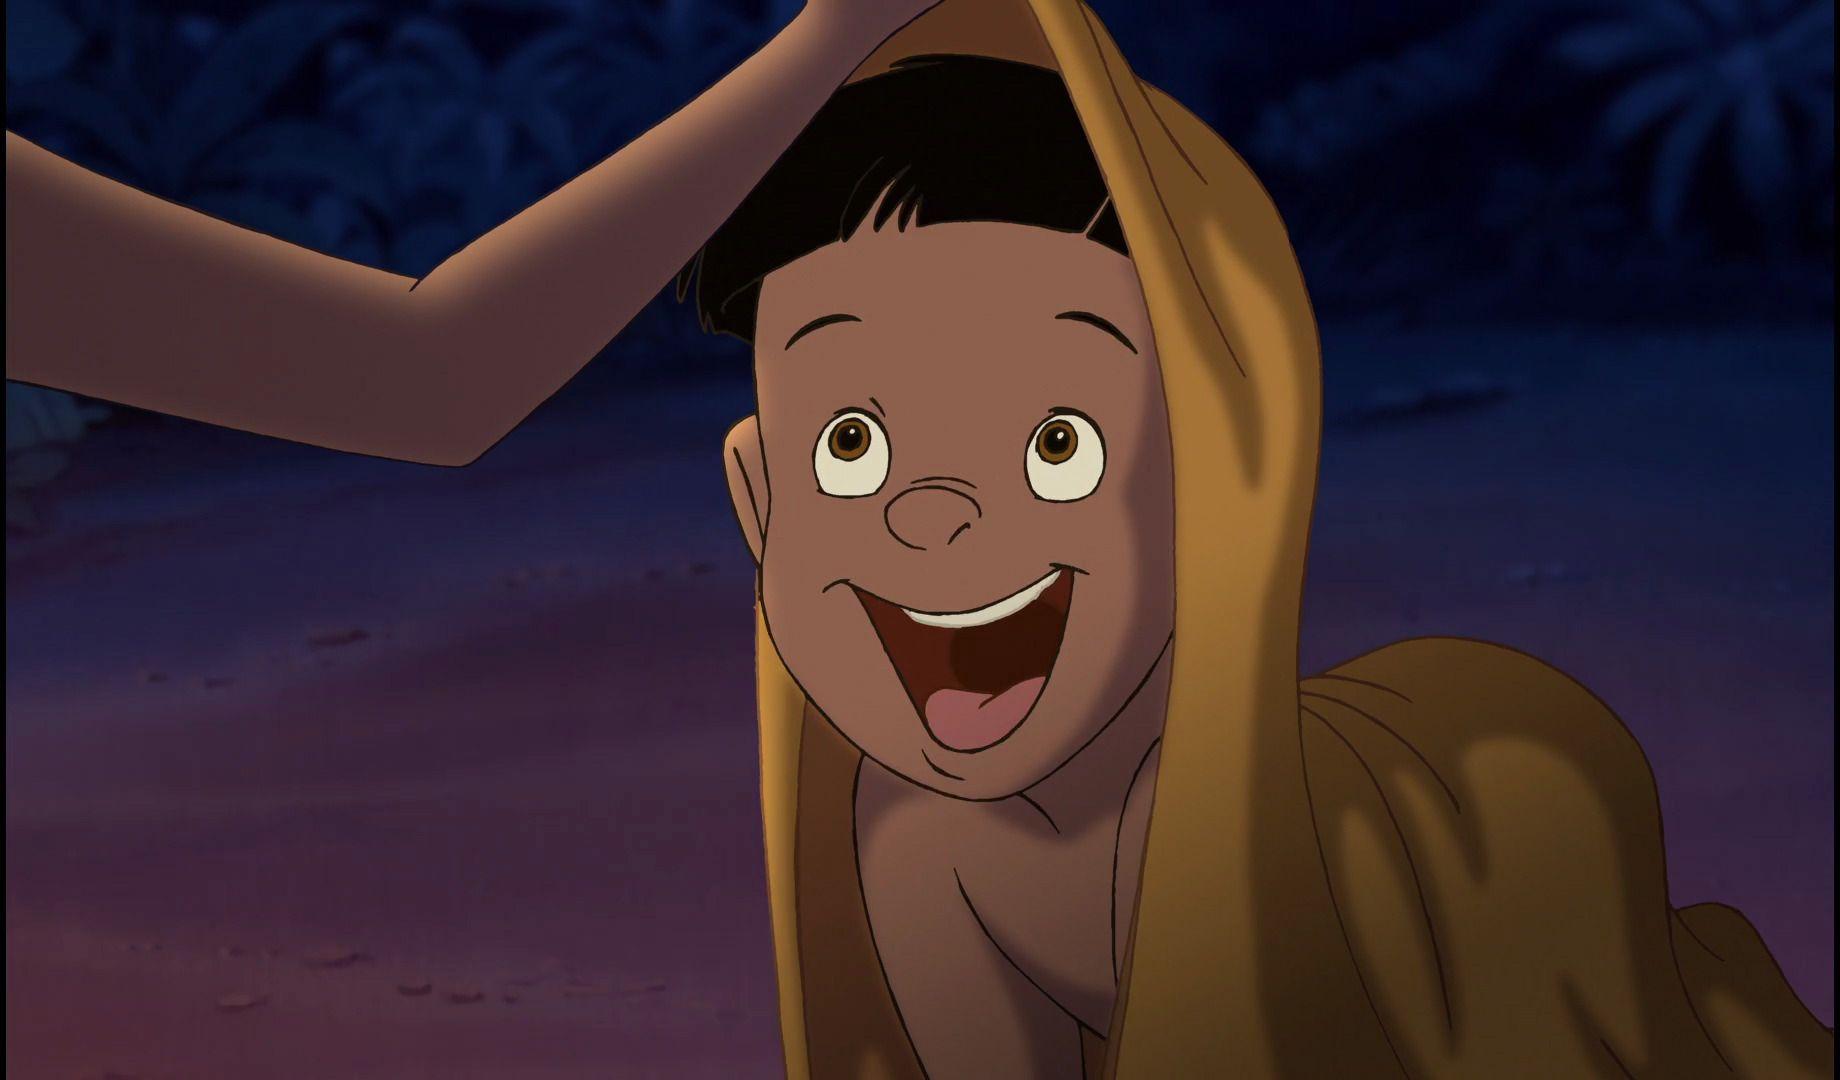 The Jungle Book 2 (2003) - Disney Screencaps | I want to ...